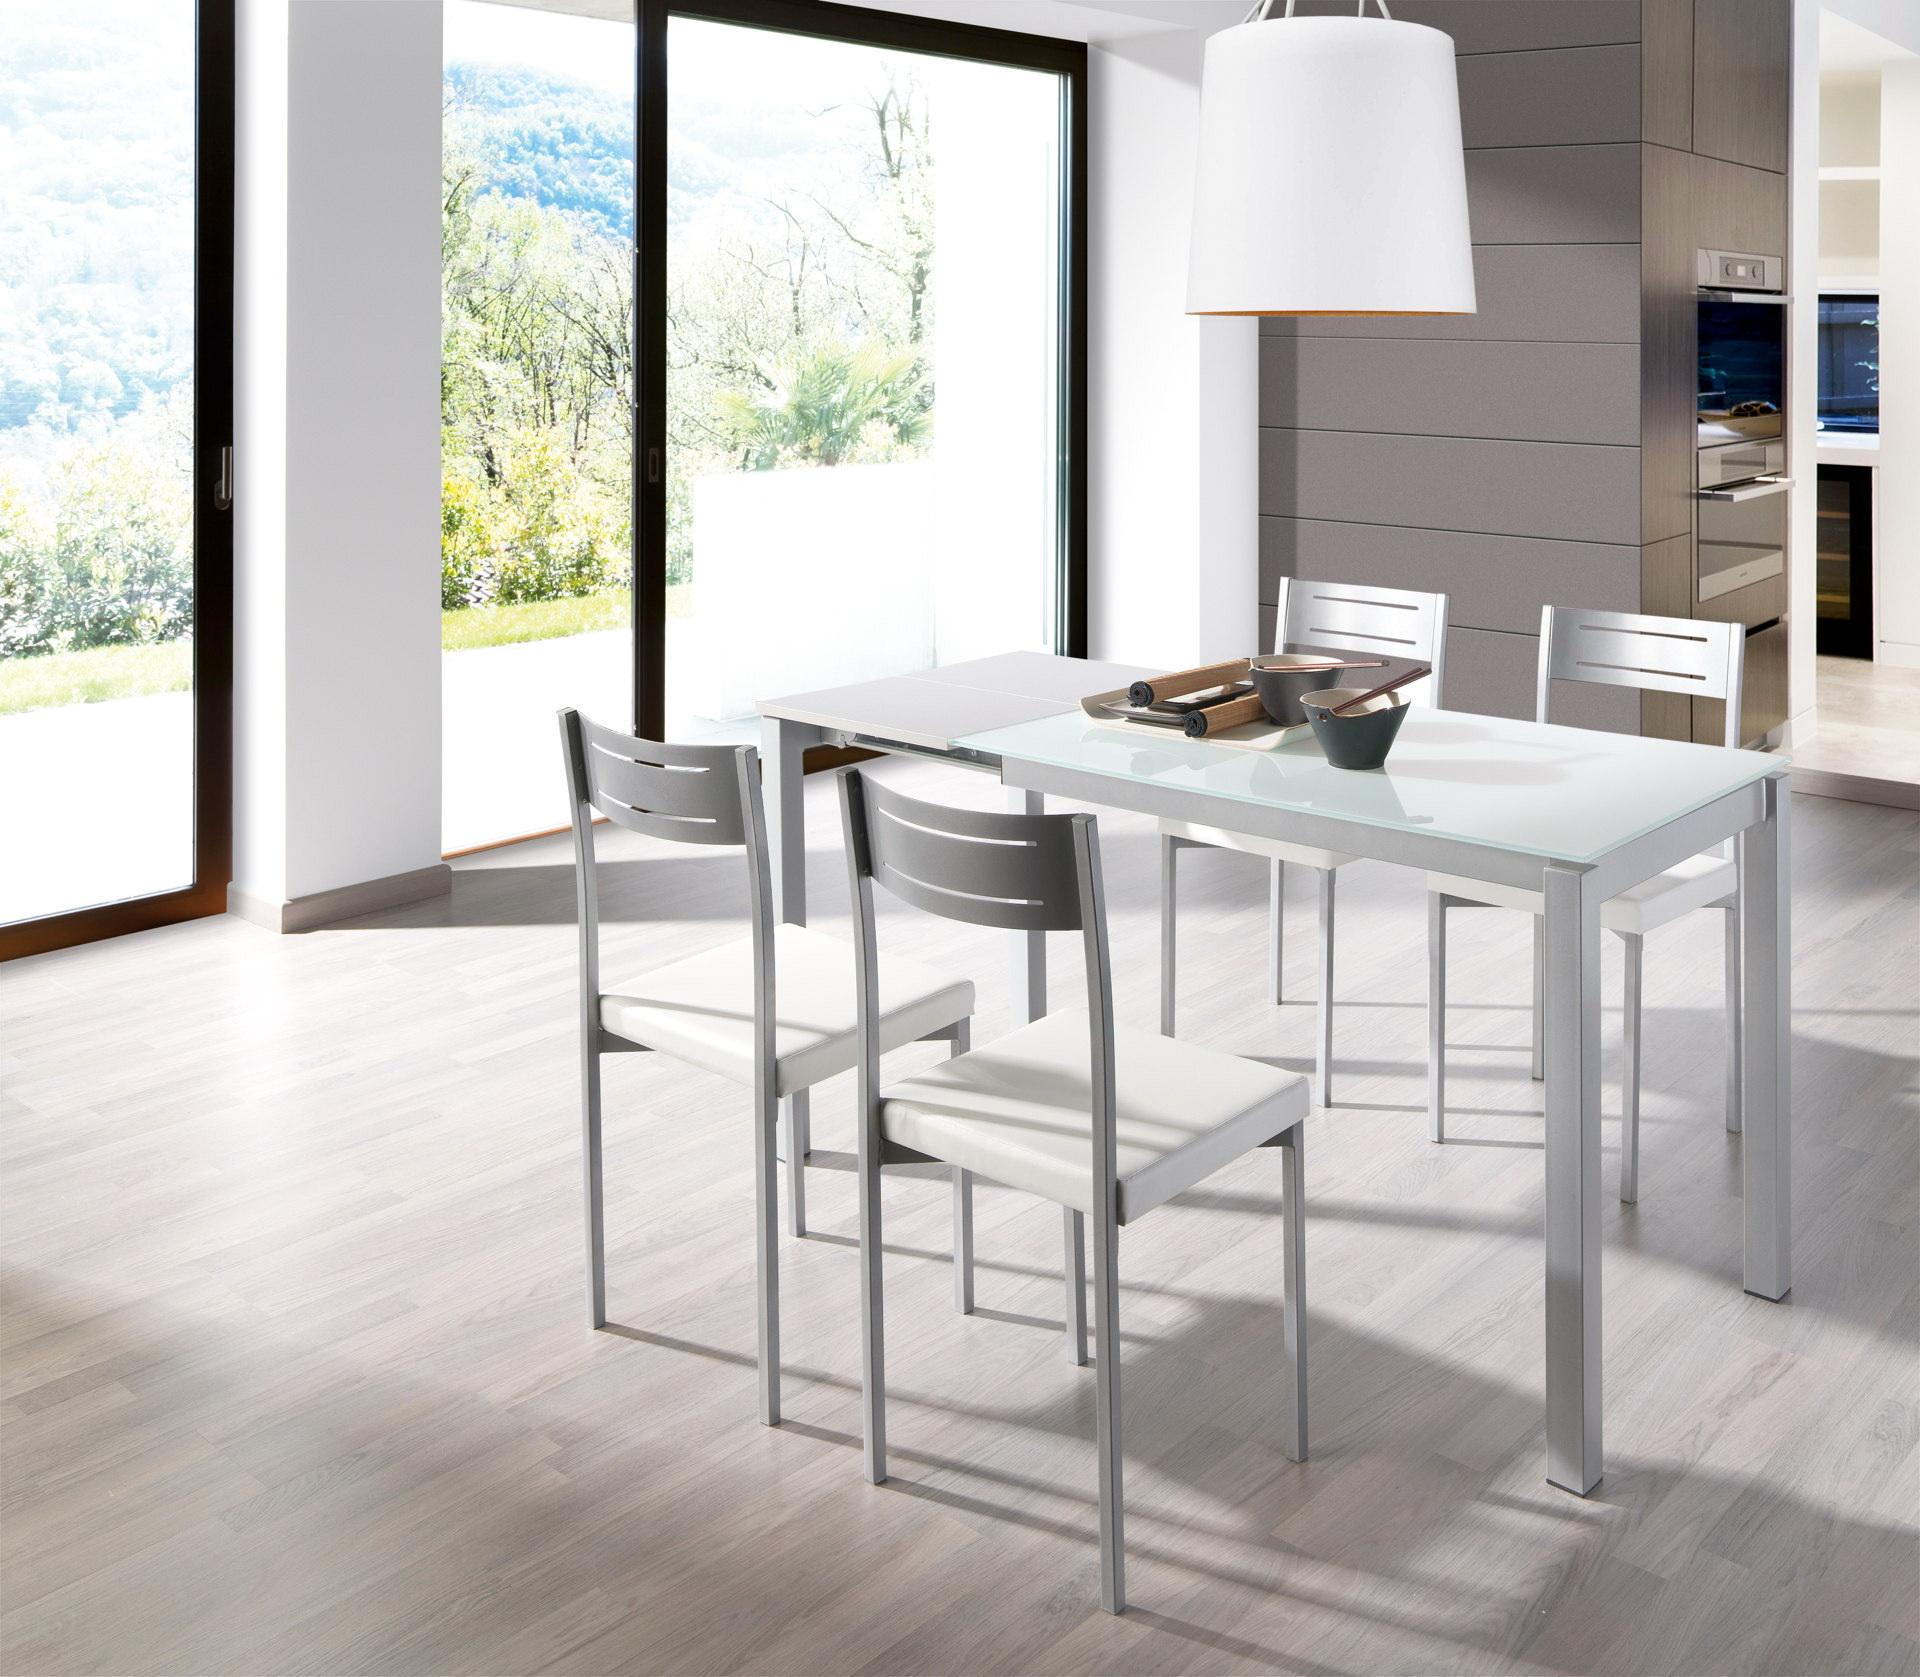 Muebles de cocina baratos en leon for Muebles mato valencia